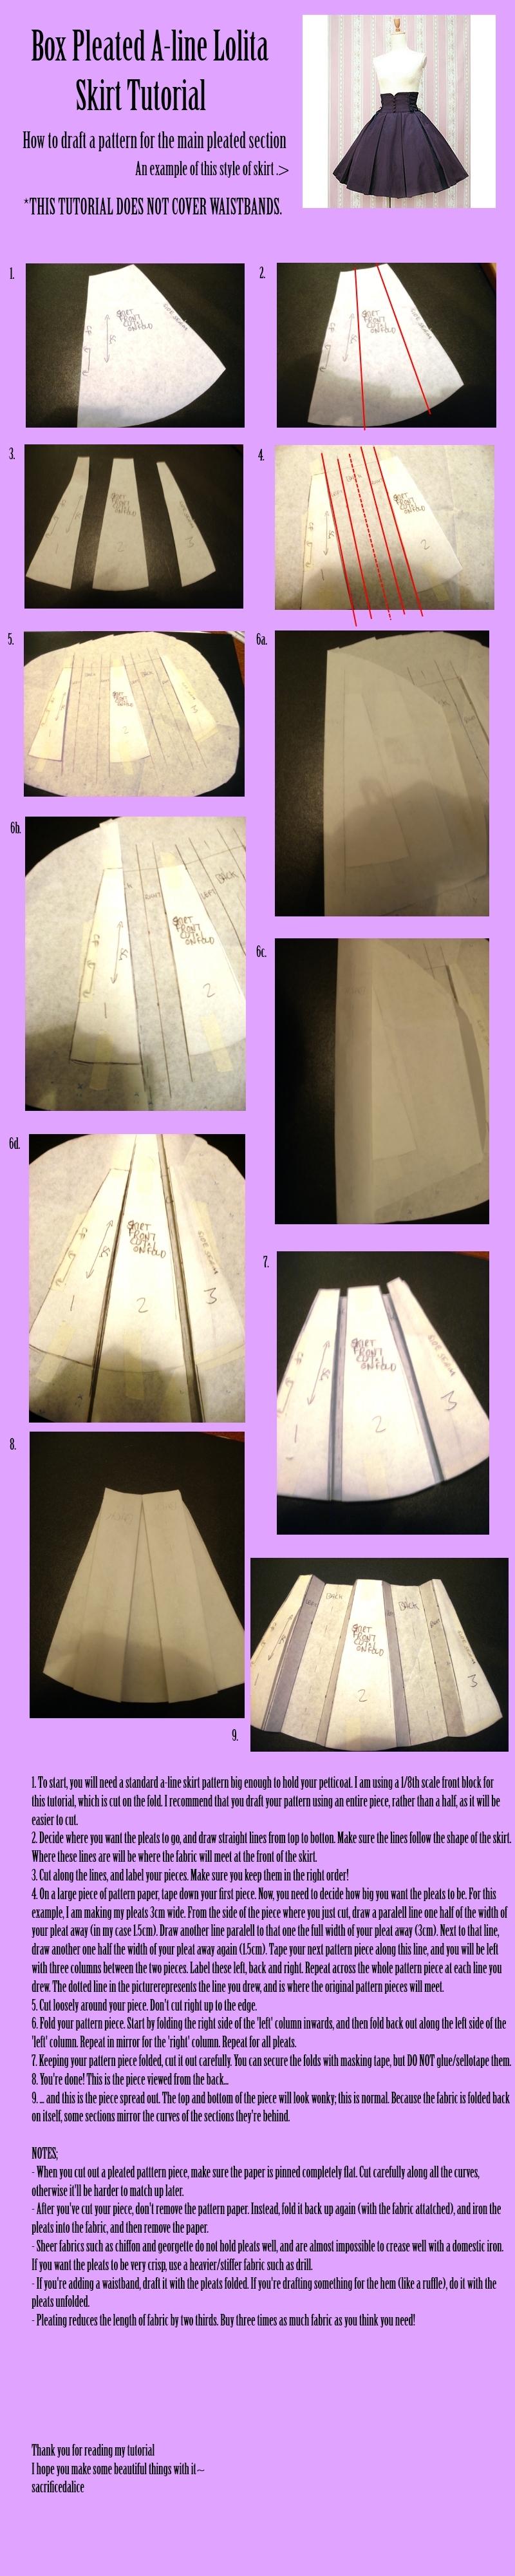 Box Pleated A-line Skirt